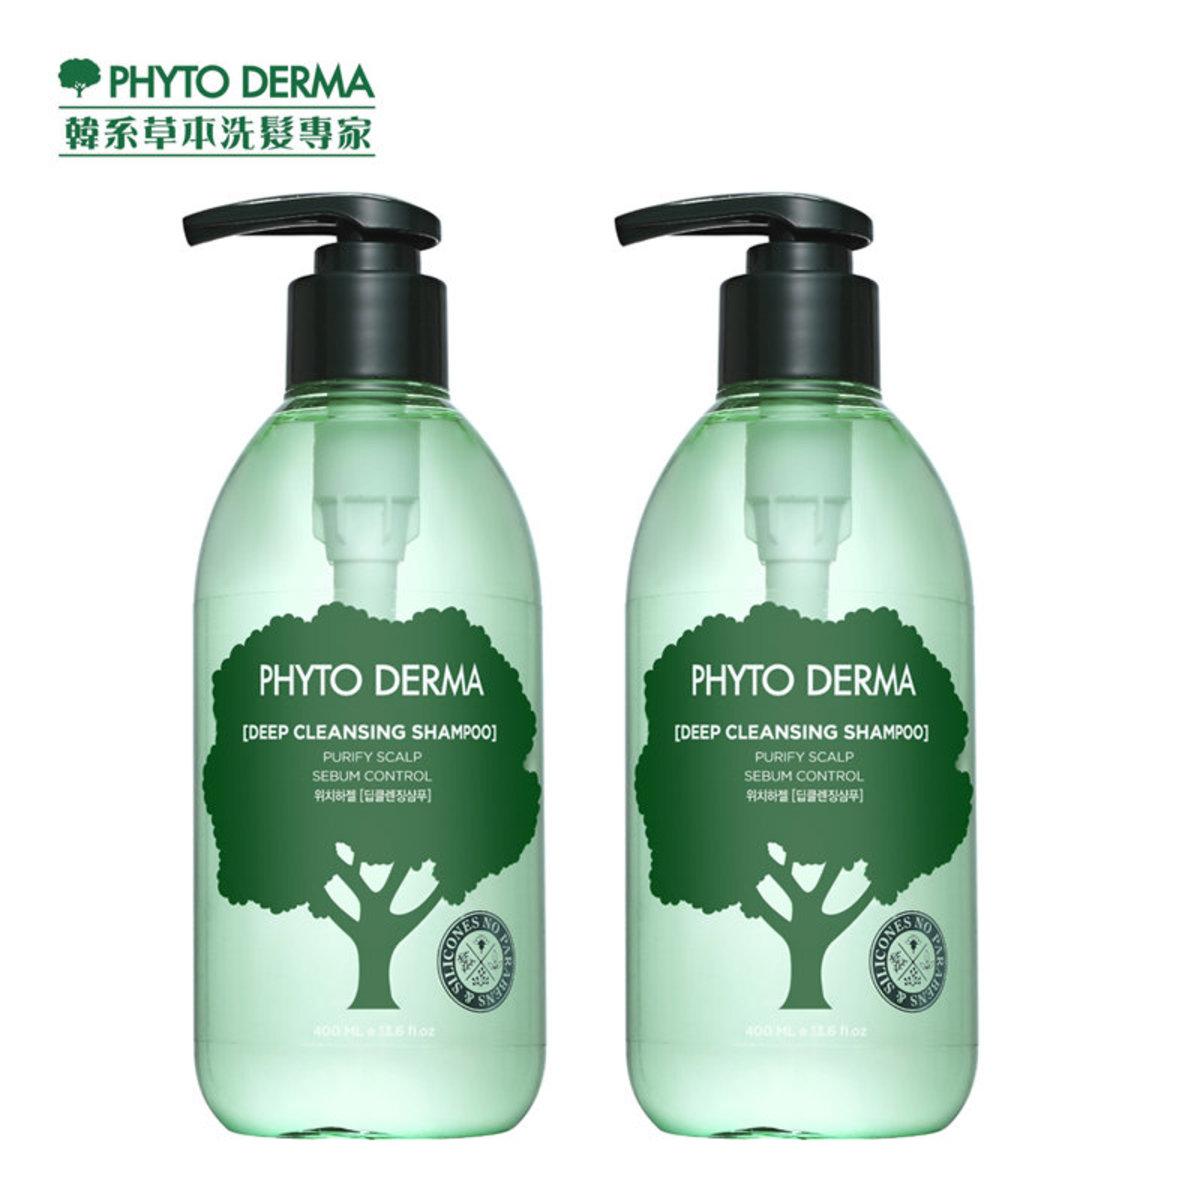 PHYTO DERMA | Deep Cleansing Shampoo 400ml x 2 | HKTVmall Online